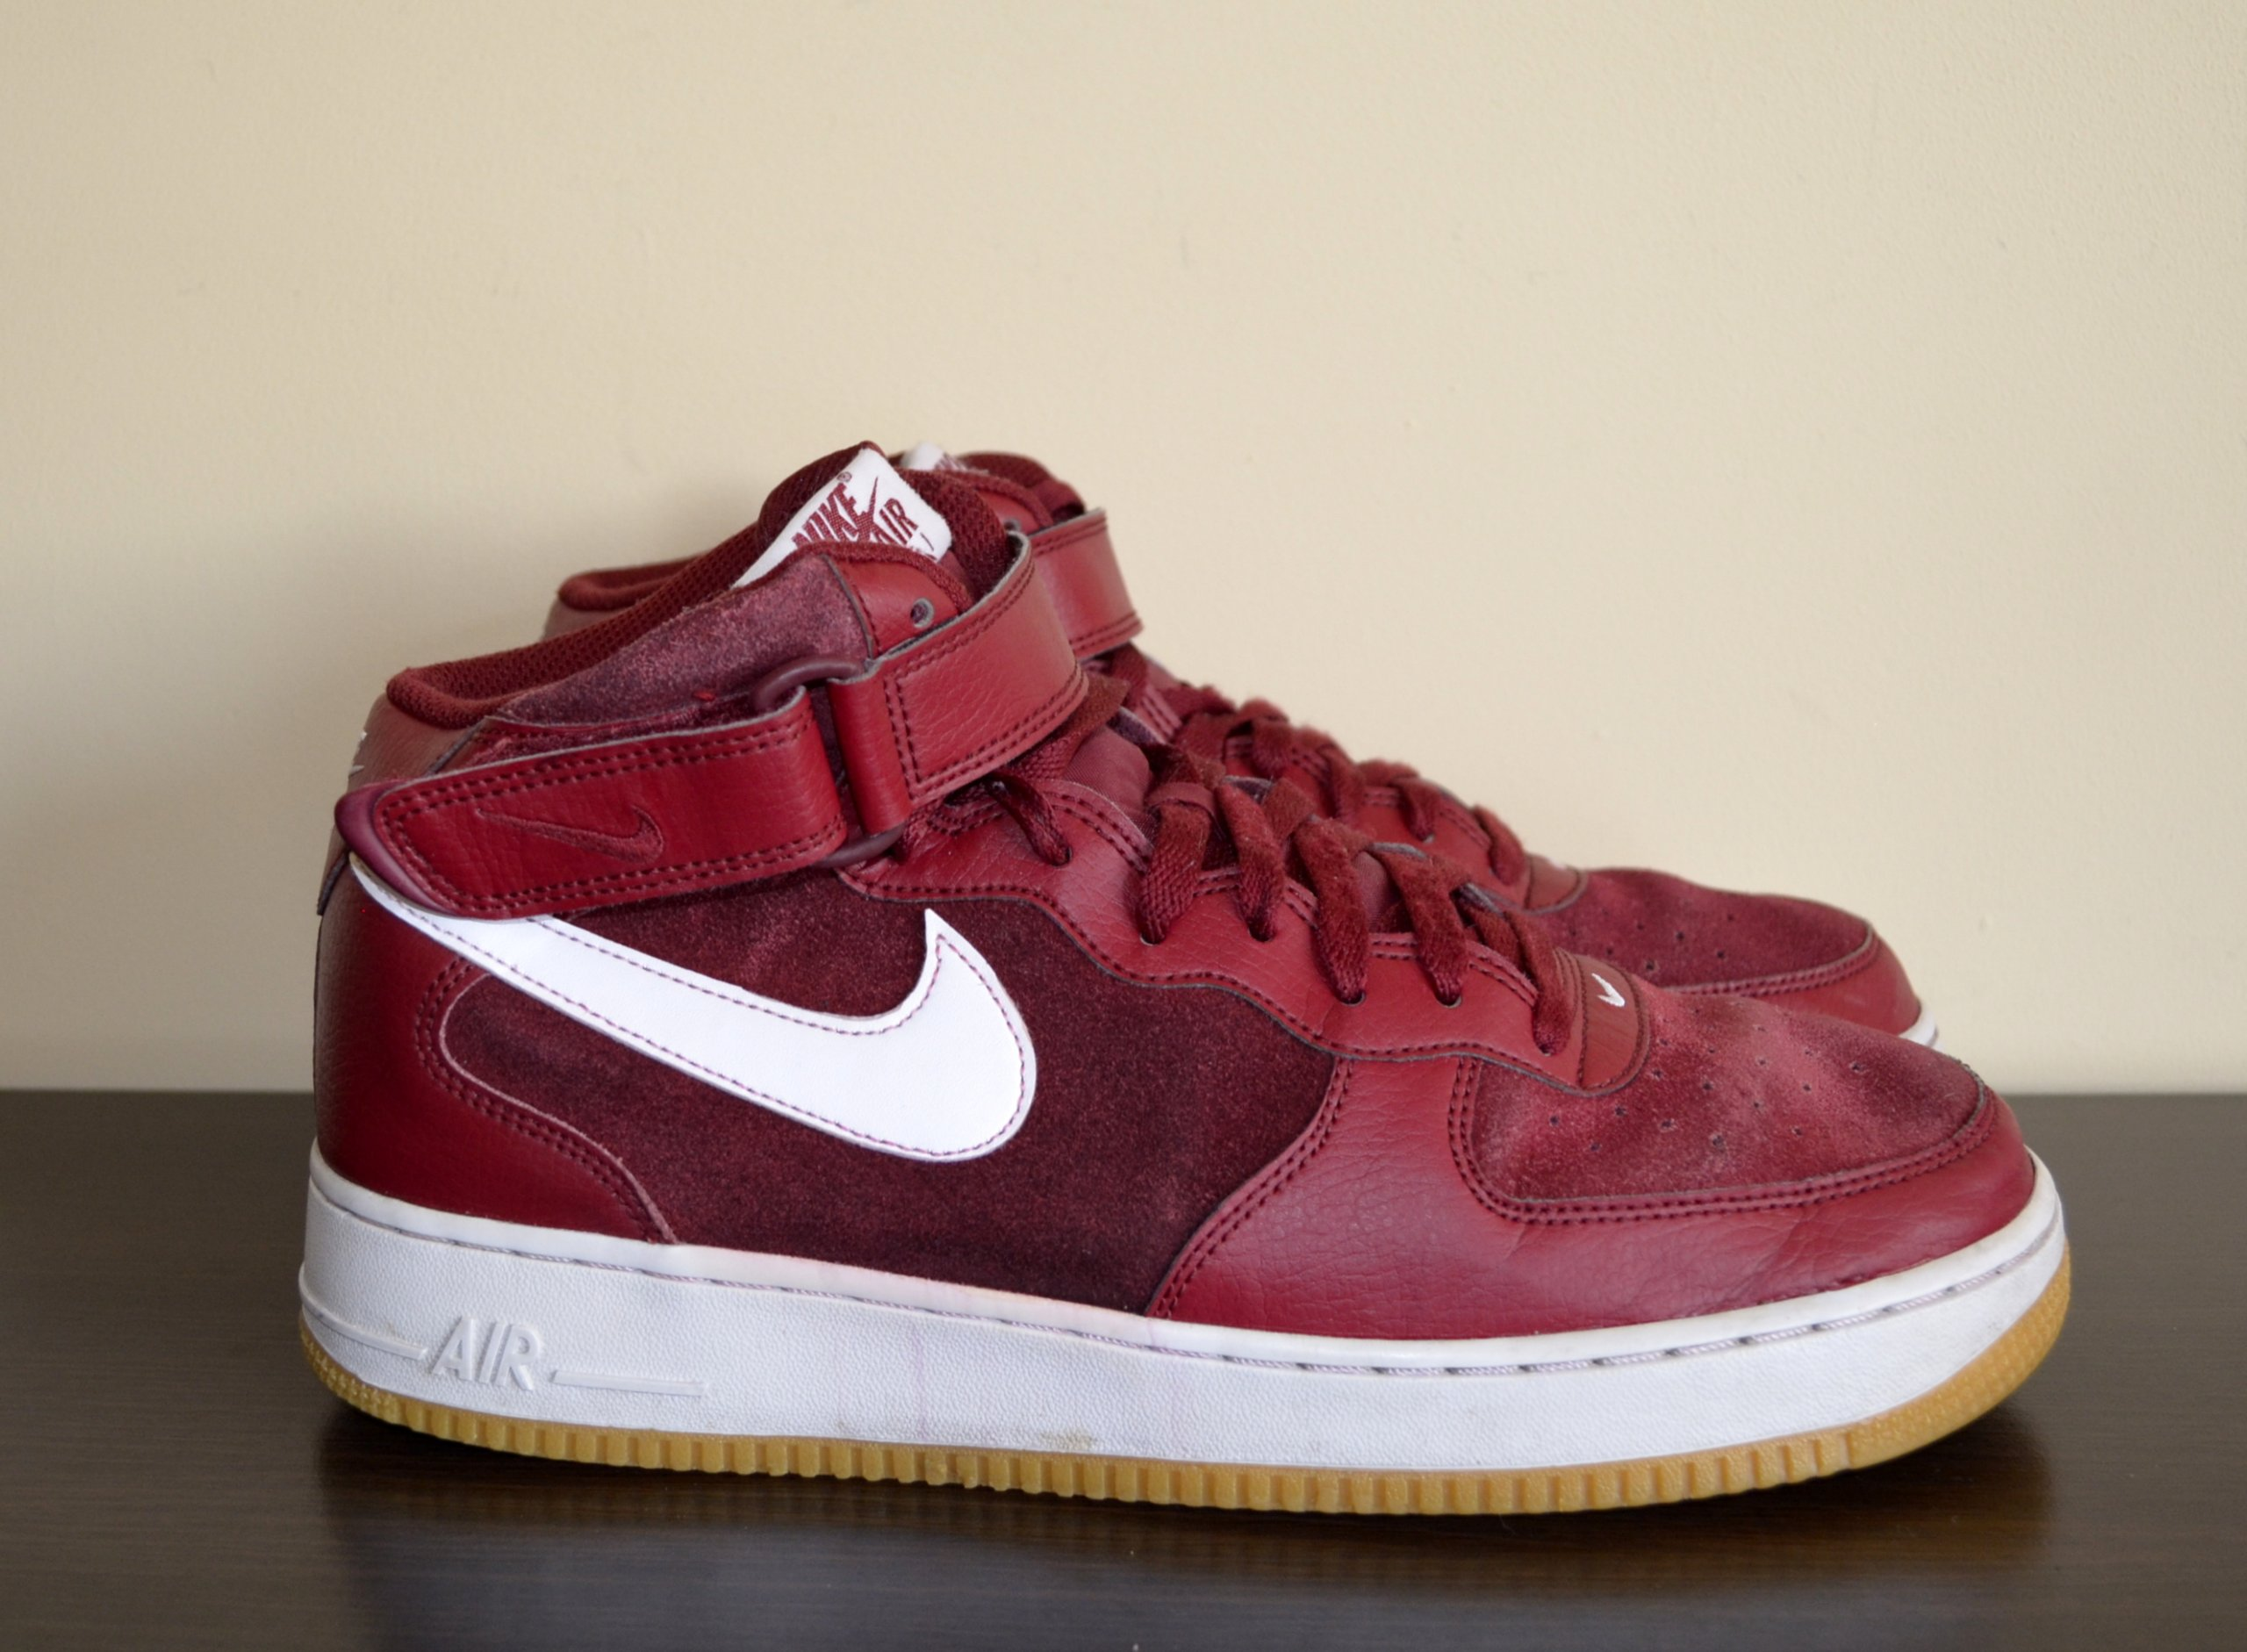 8909700d Buty sportowe męskie Nike Air Force 1 Mid 07 bdb - 7234833175 ...